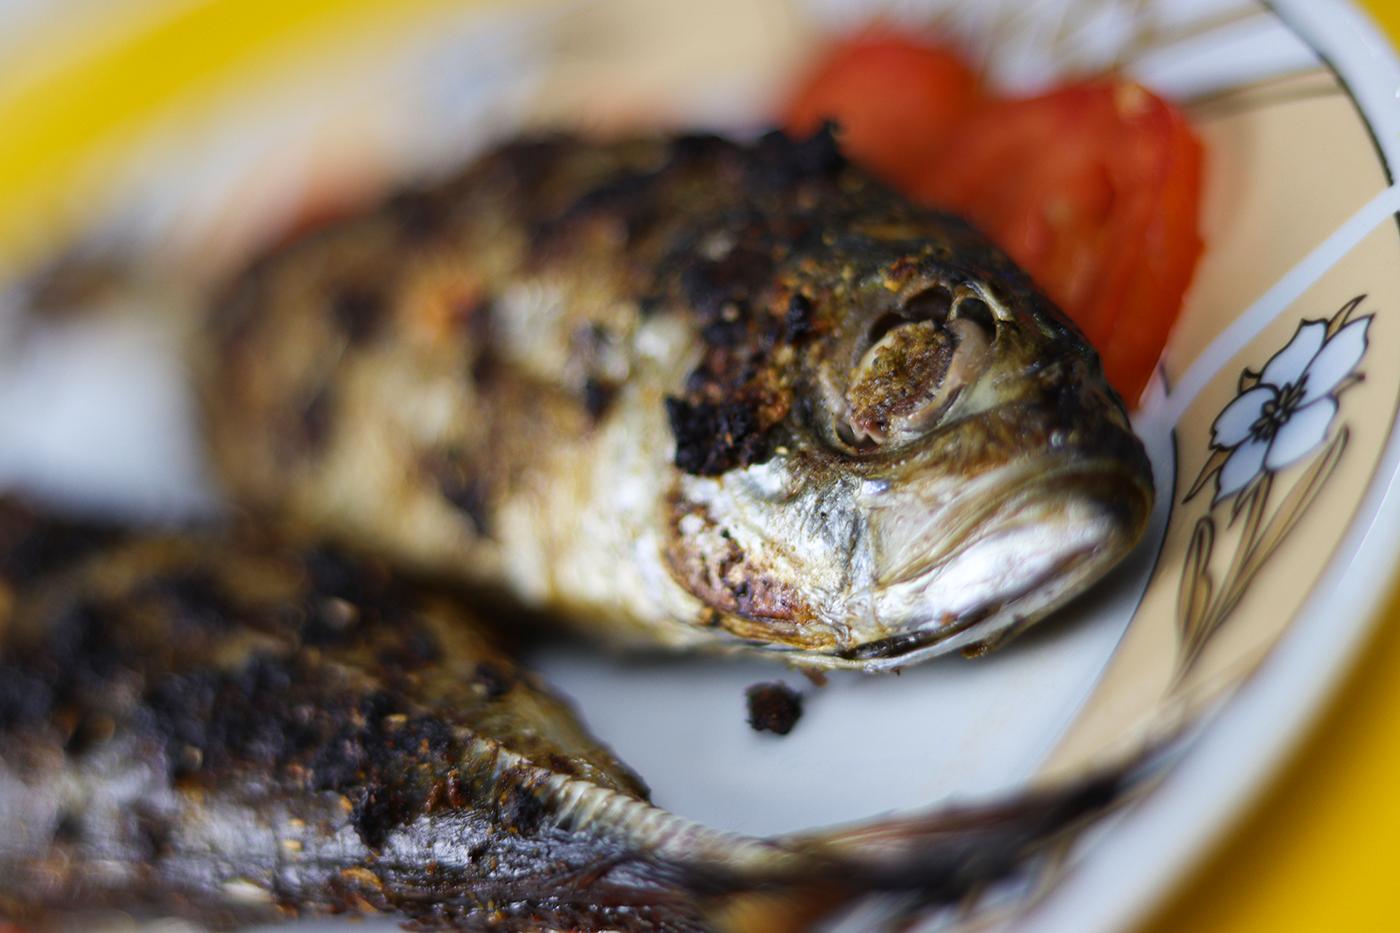 سمك مشوي بالفرن وجبات سريعة خفيفة لطيفة Cooking Recipes Cooking Recipes